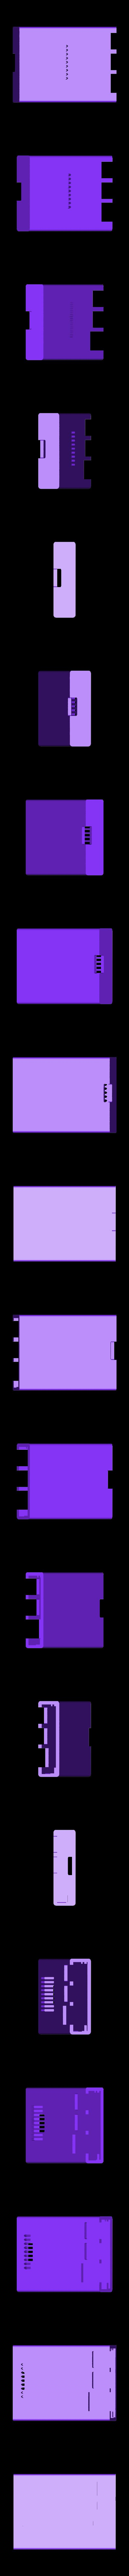 Raspberry_Pi_3B%2B_Sleeve.Sleeve.Body1.stl Télécharger fichier STL gratuit Raspberry Pi 3B+ Sleeve • Design à imprimer en 3D, Wilko